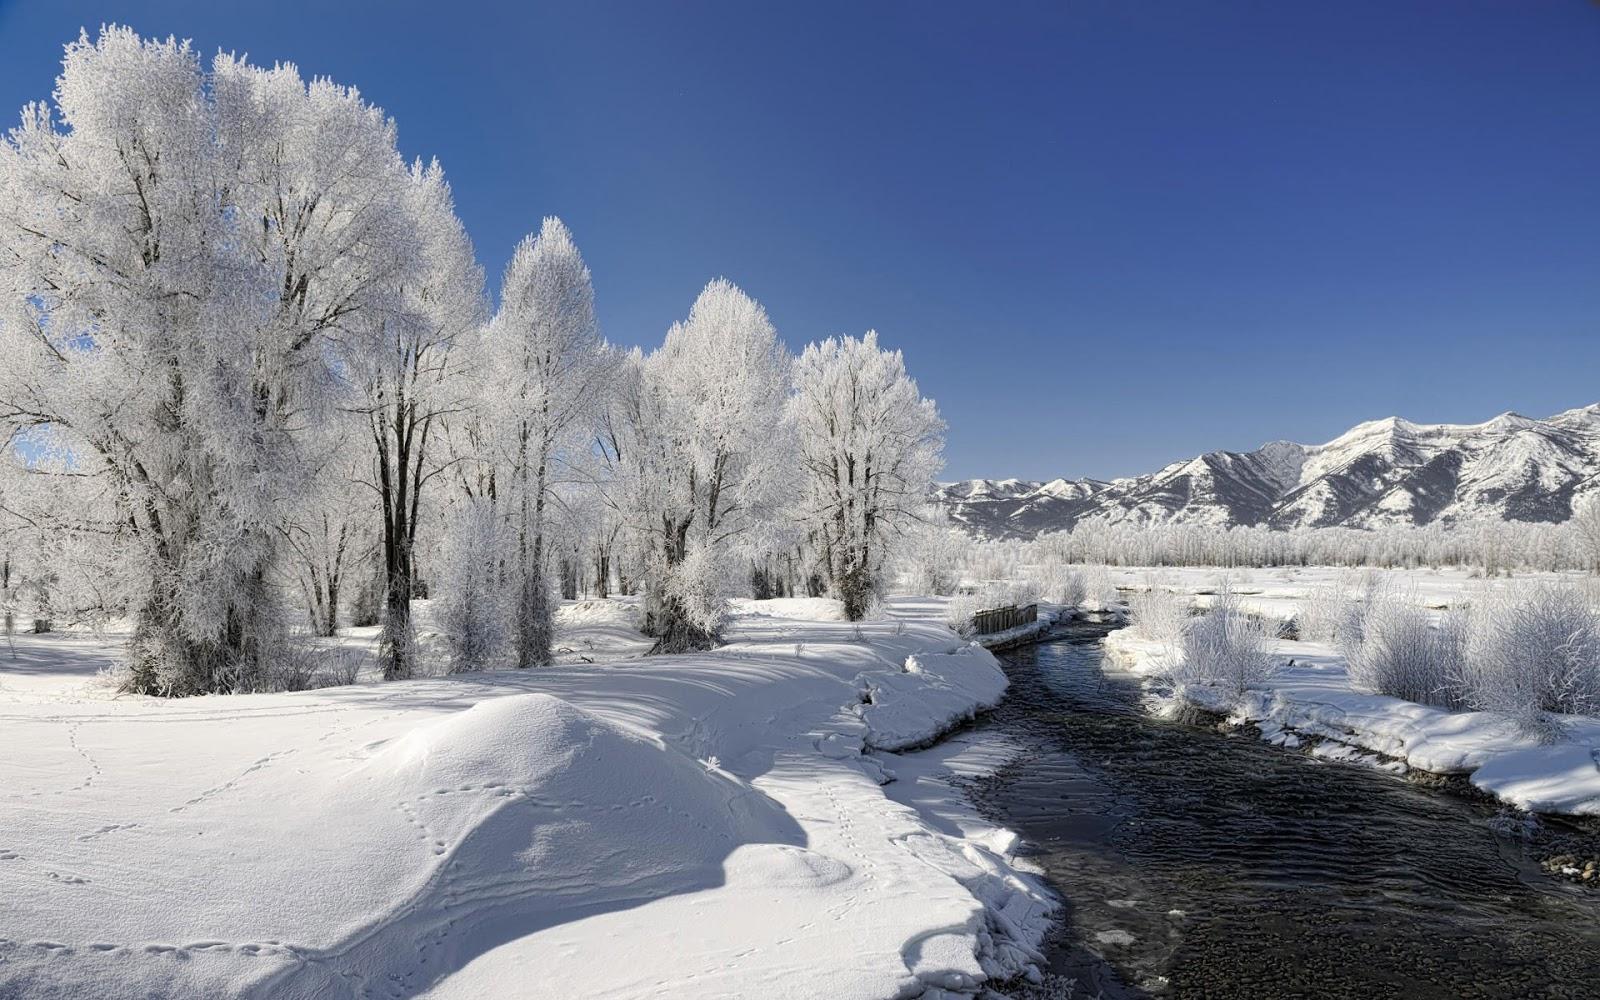 winter wallpaper winter snowfall beautiful wallpaper beauty of nature 1600x1000